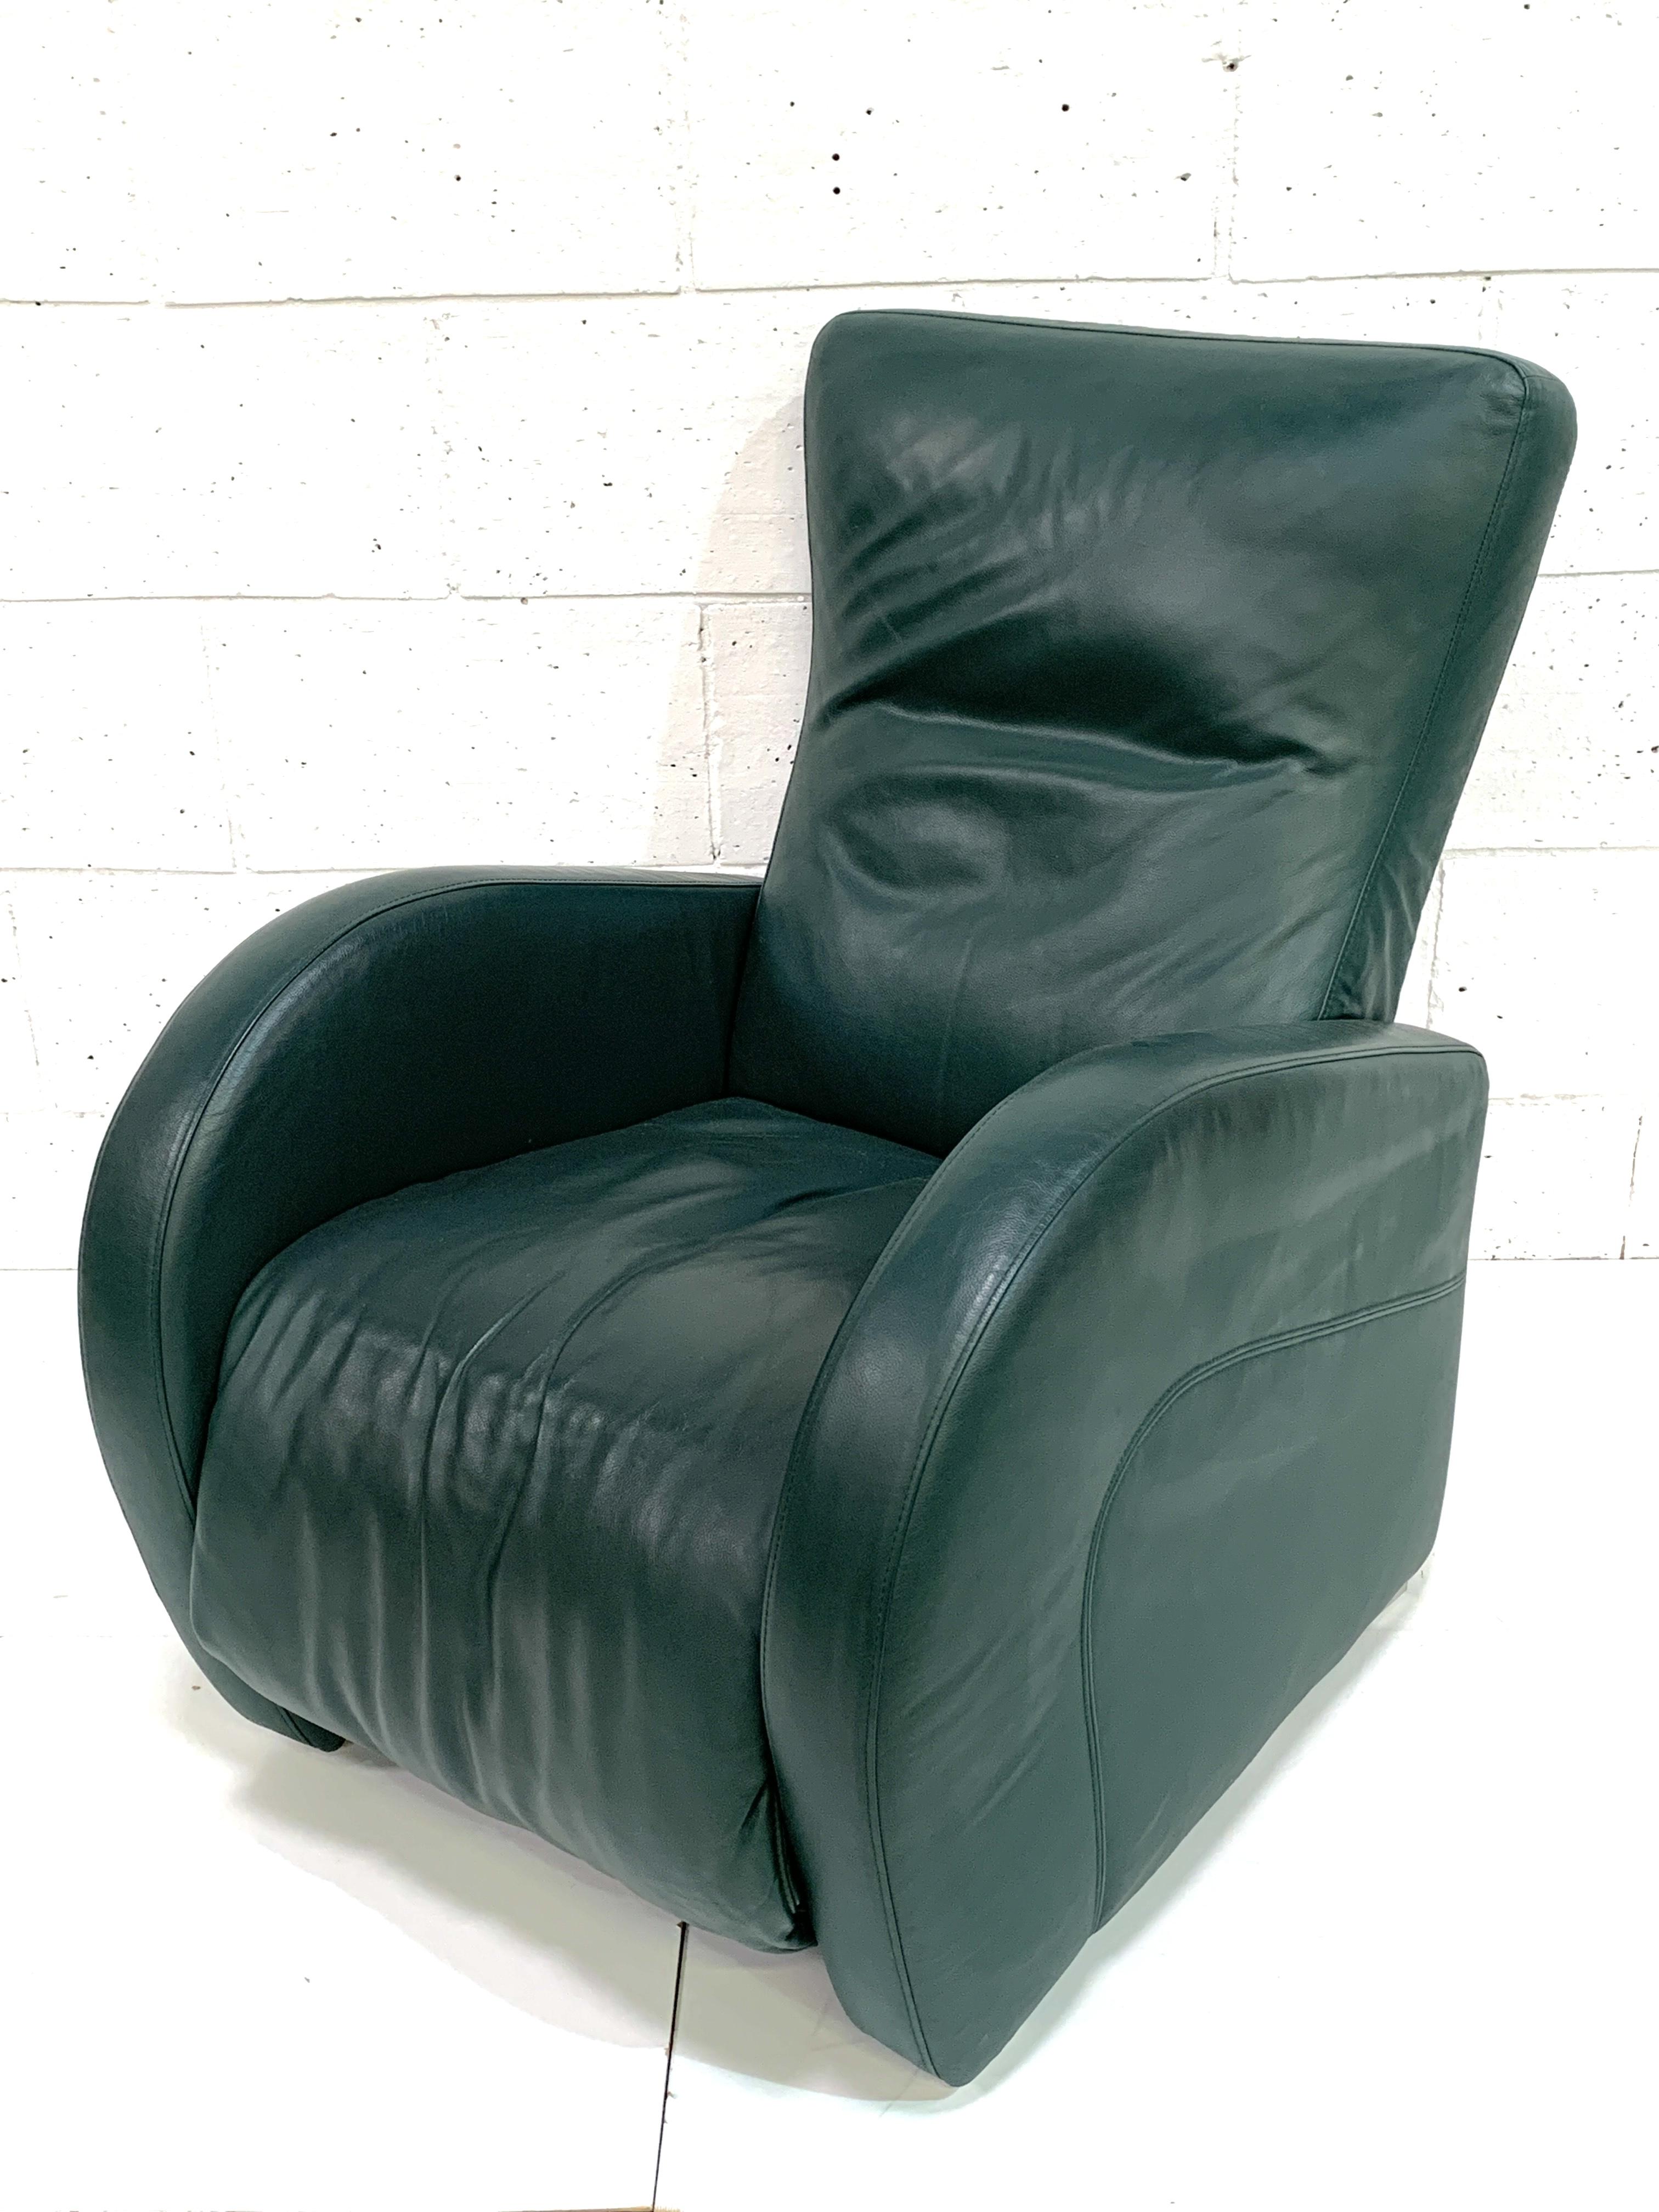 Steinhoff TV reclinable armchair